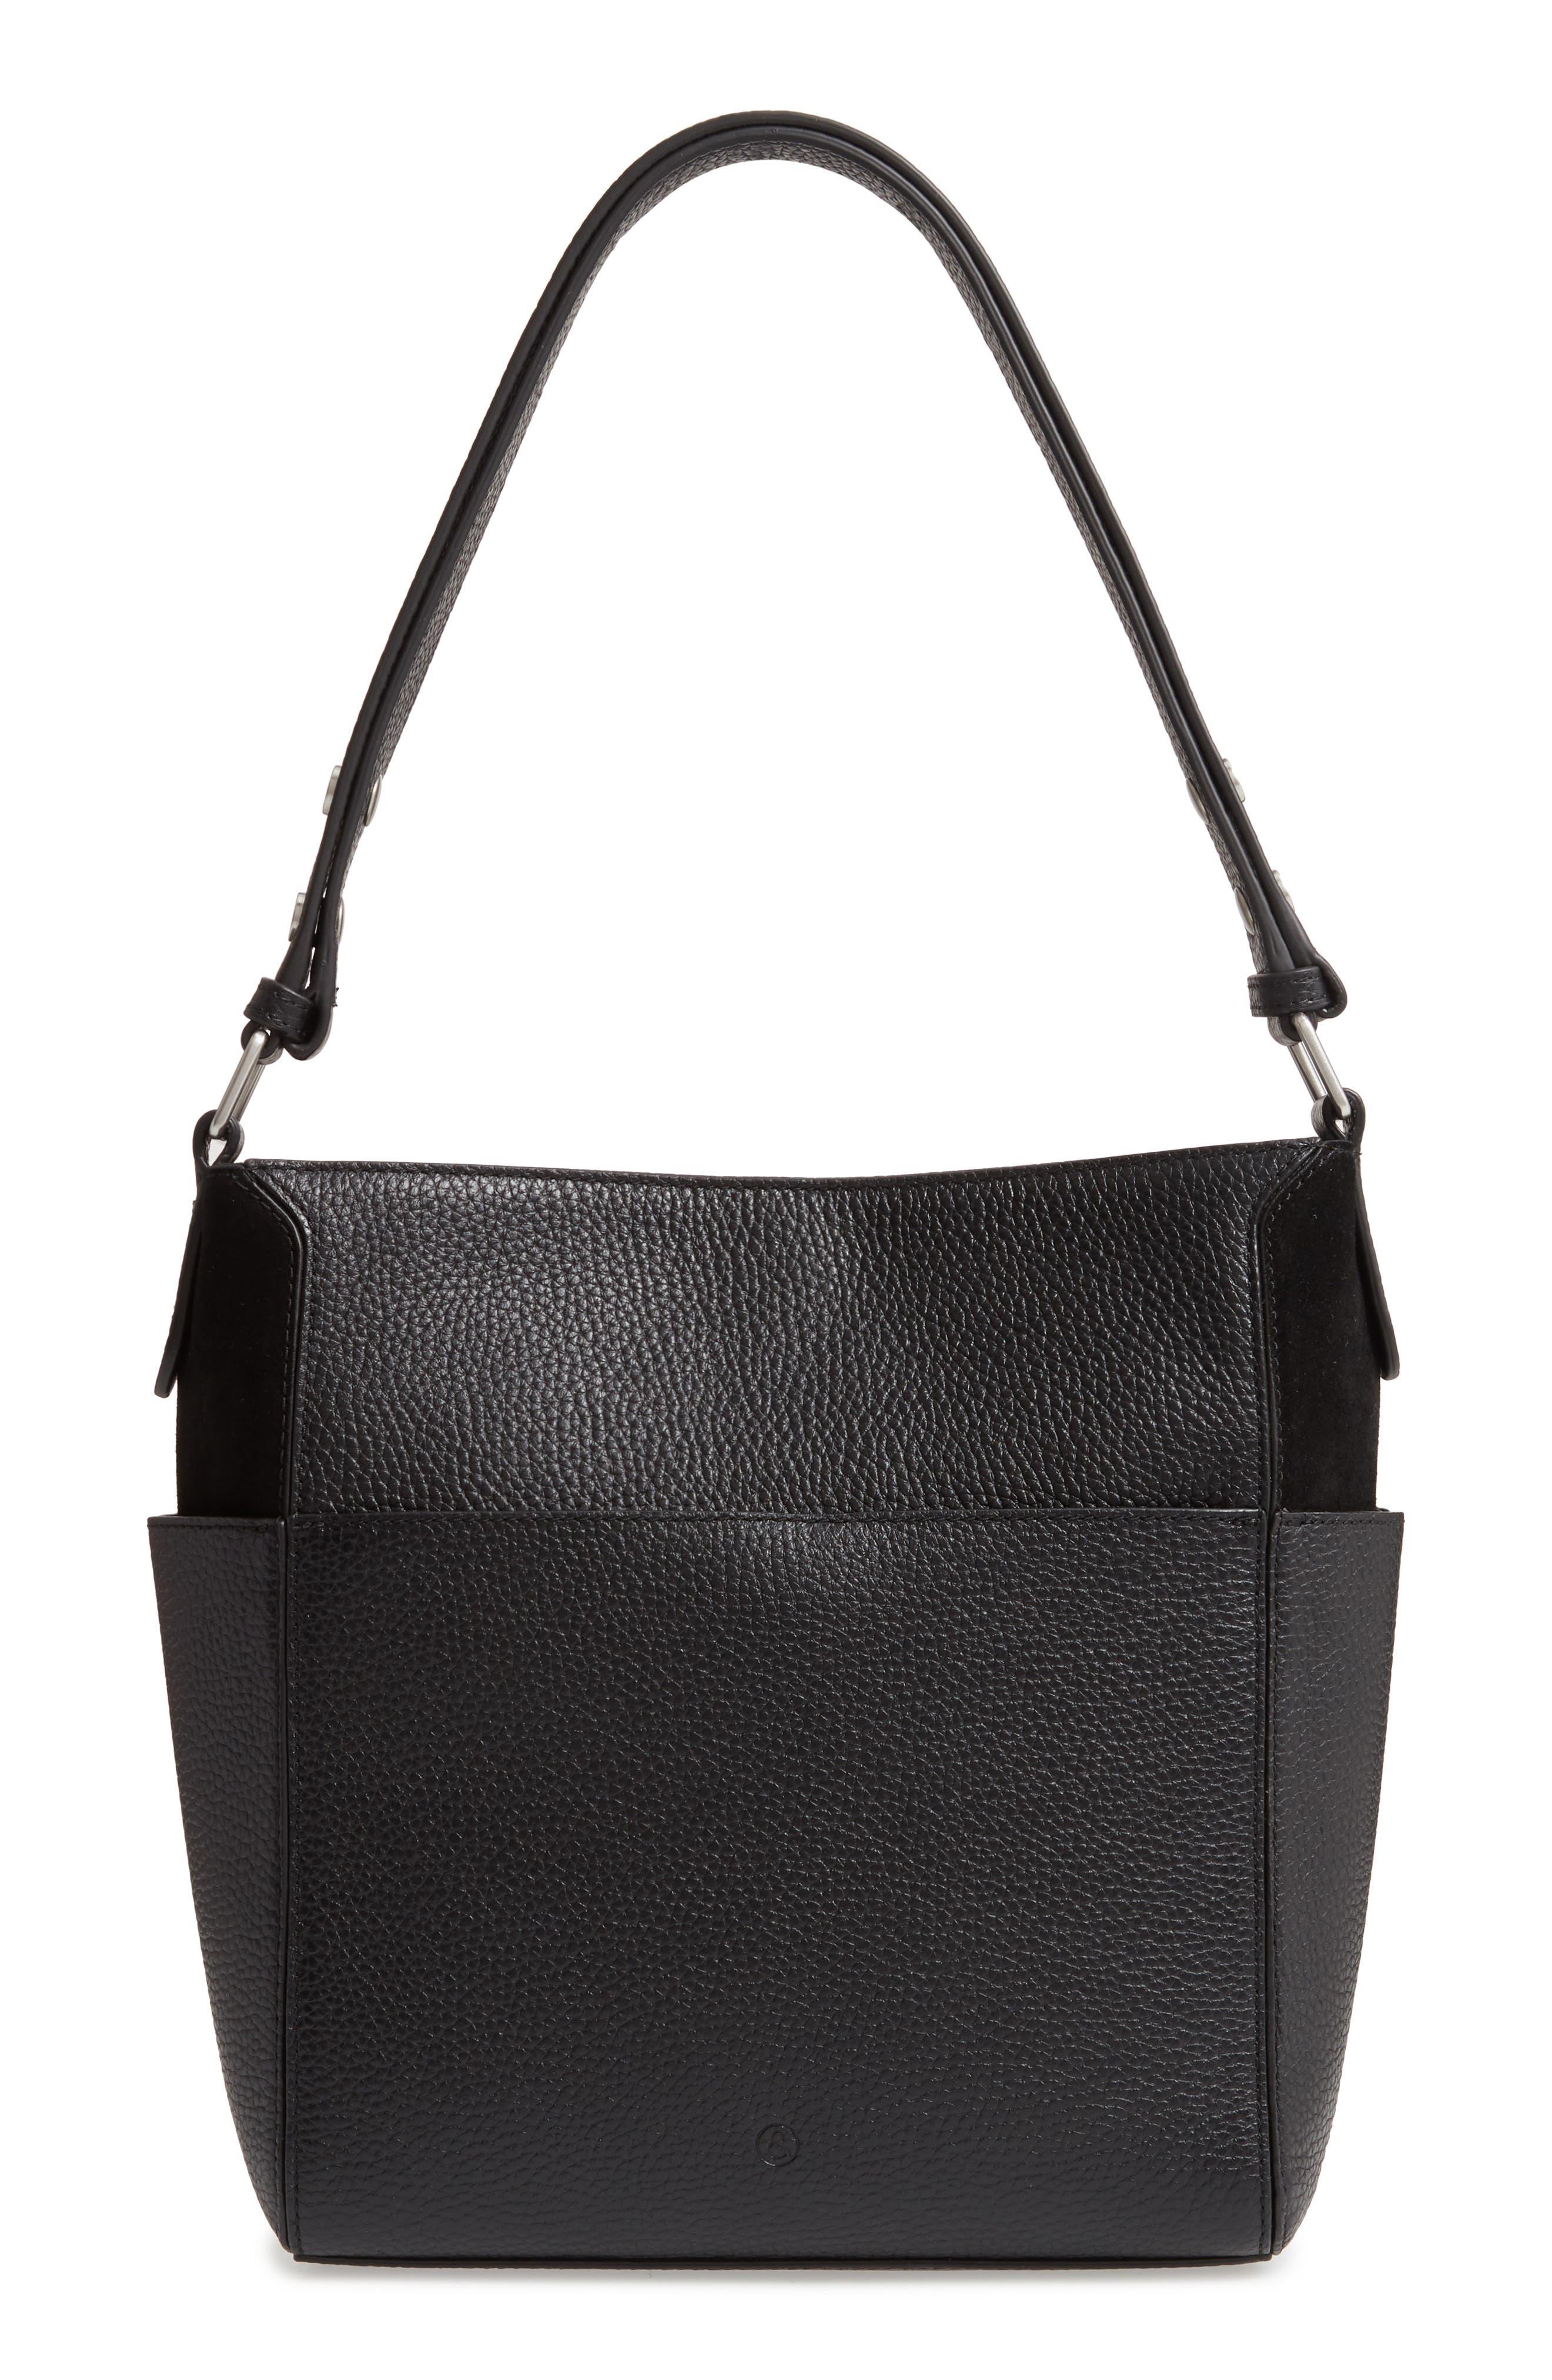 TREASURE & BOND,                             Campbell Leather & Suede Bucket Bag,                             Alternate thumbnail 3, color,                             BLACK